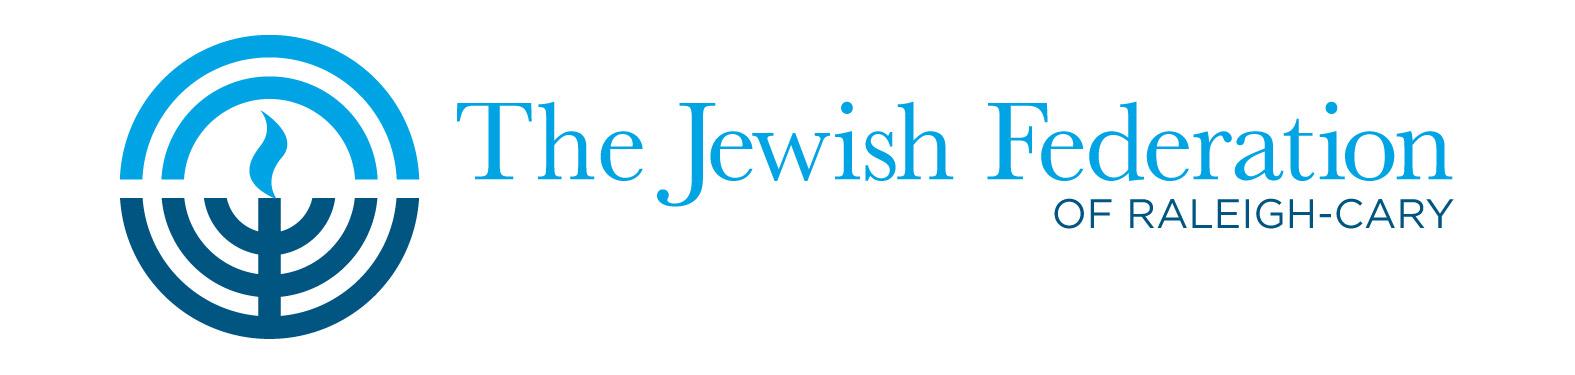 JF_Logo_2C_RaleyCary.jpg